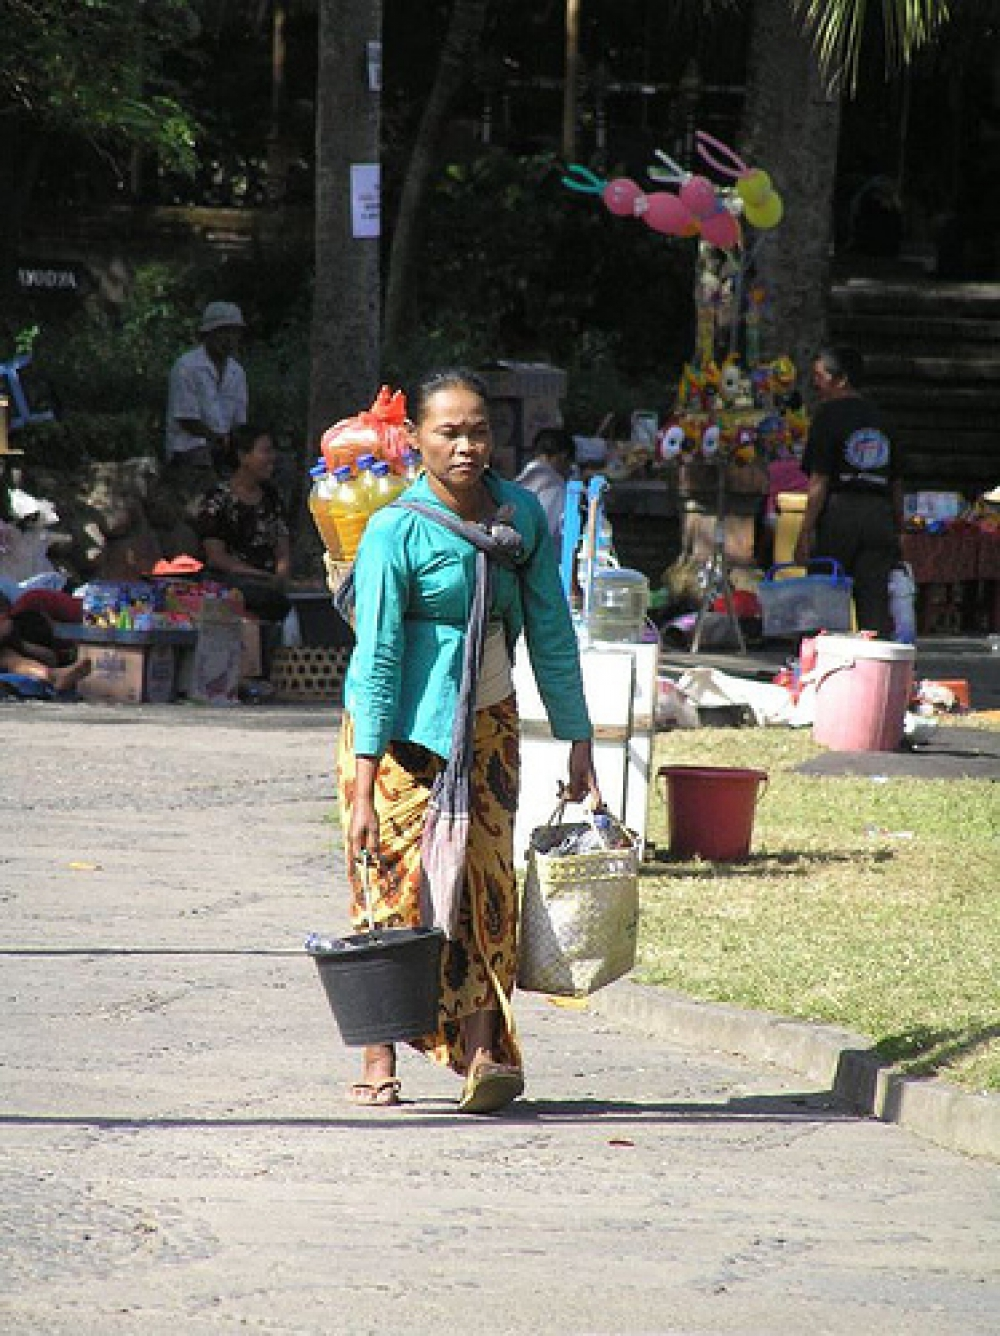 60 Yacths Enter Wakatobi at Conclusion of SWB